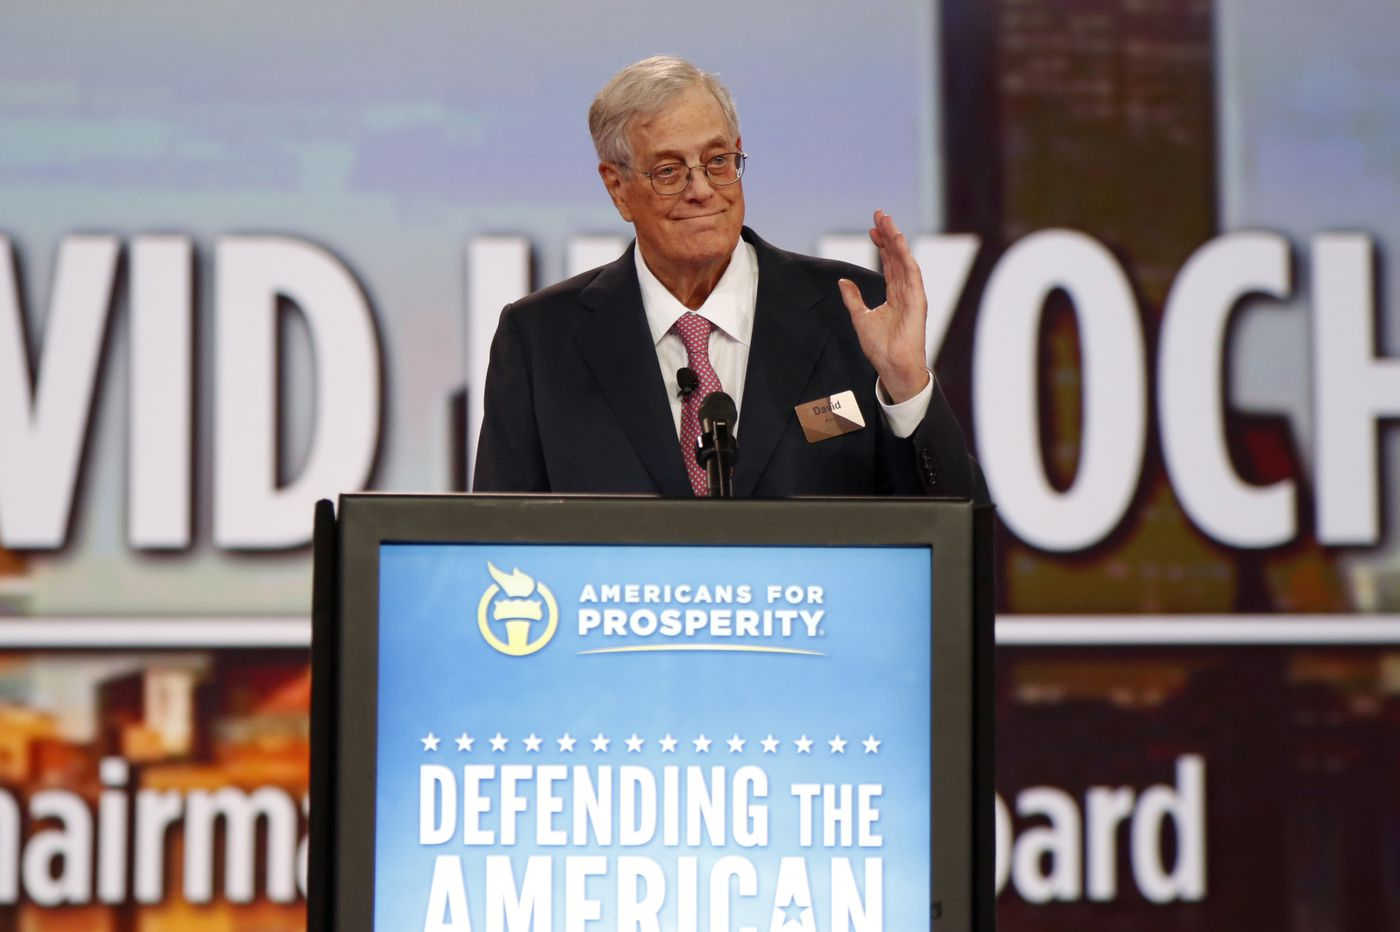 David Koch, famed billionaire conservative donor, dies at age 79